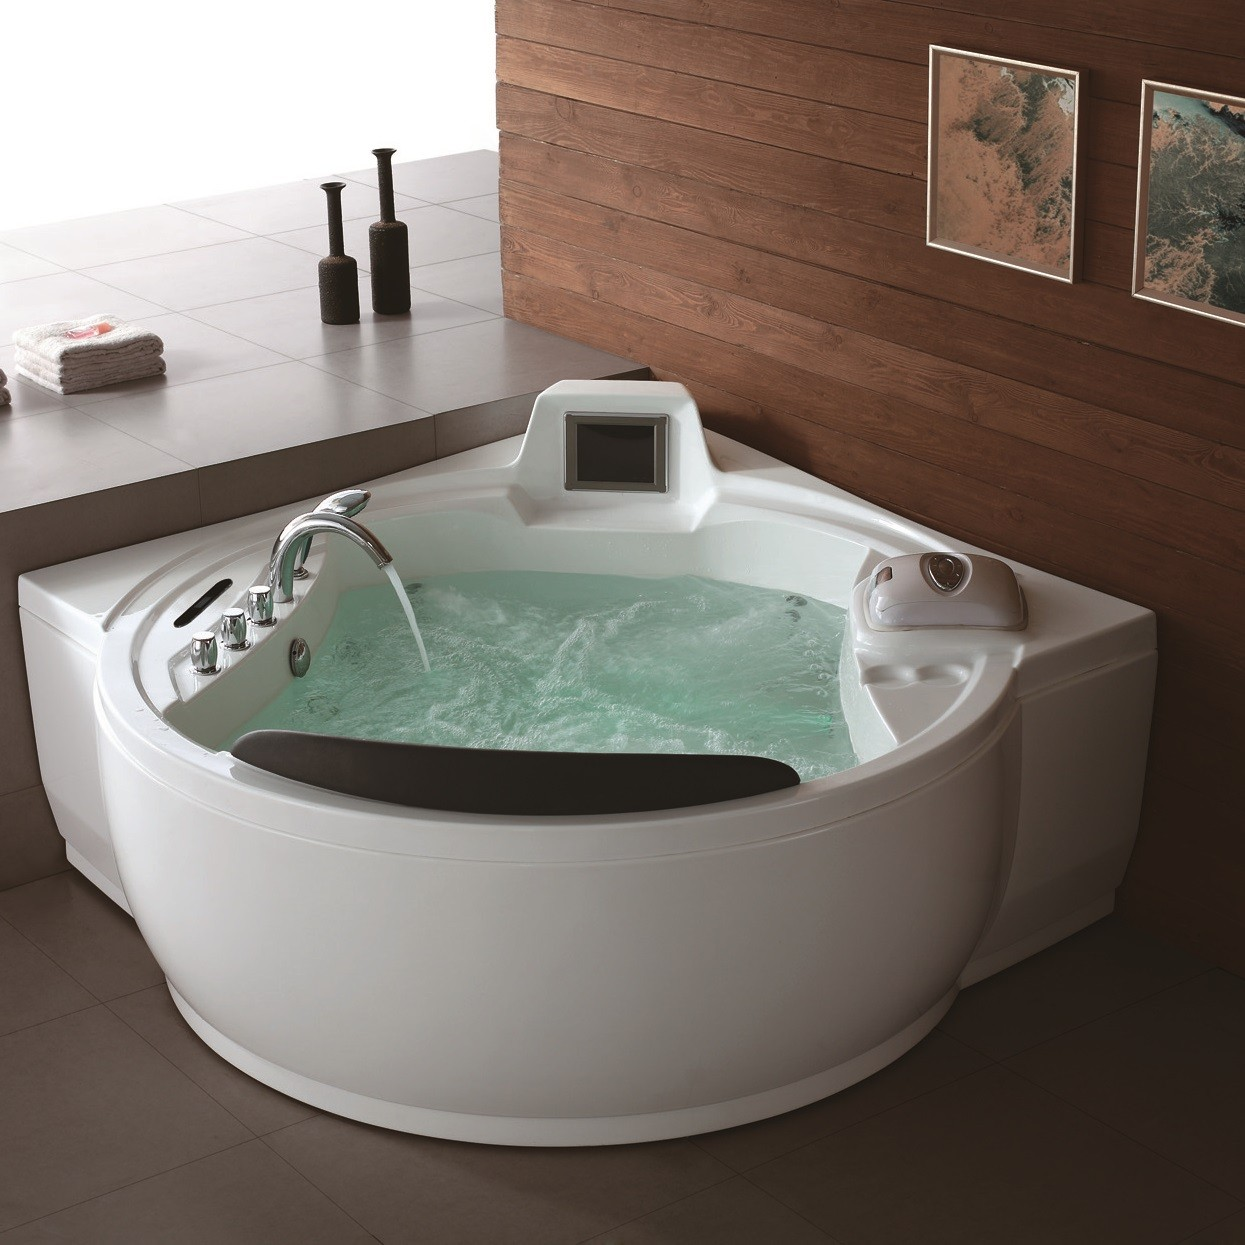 whirlpool bath freeport whirlpool tub MJIKZVF